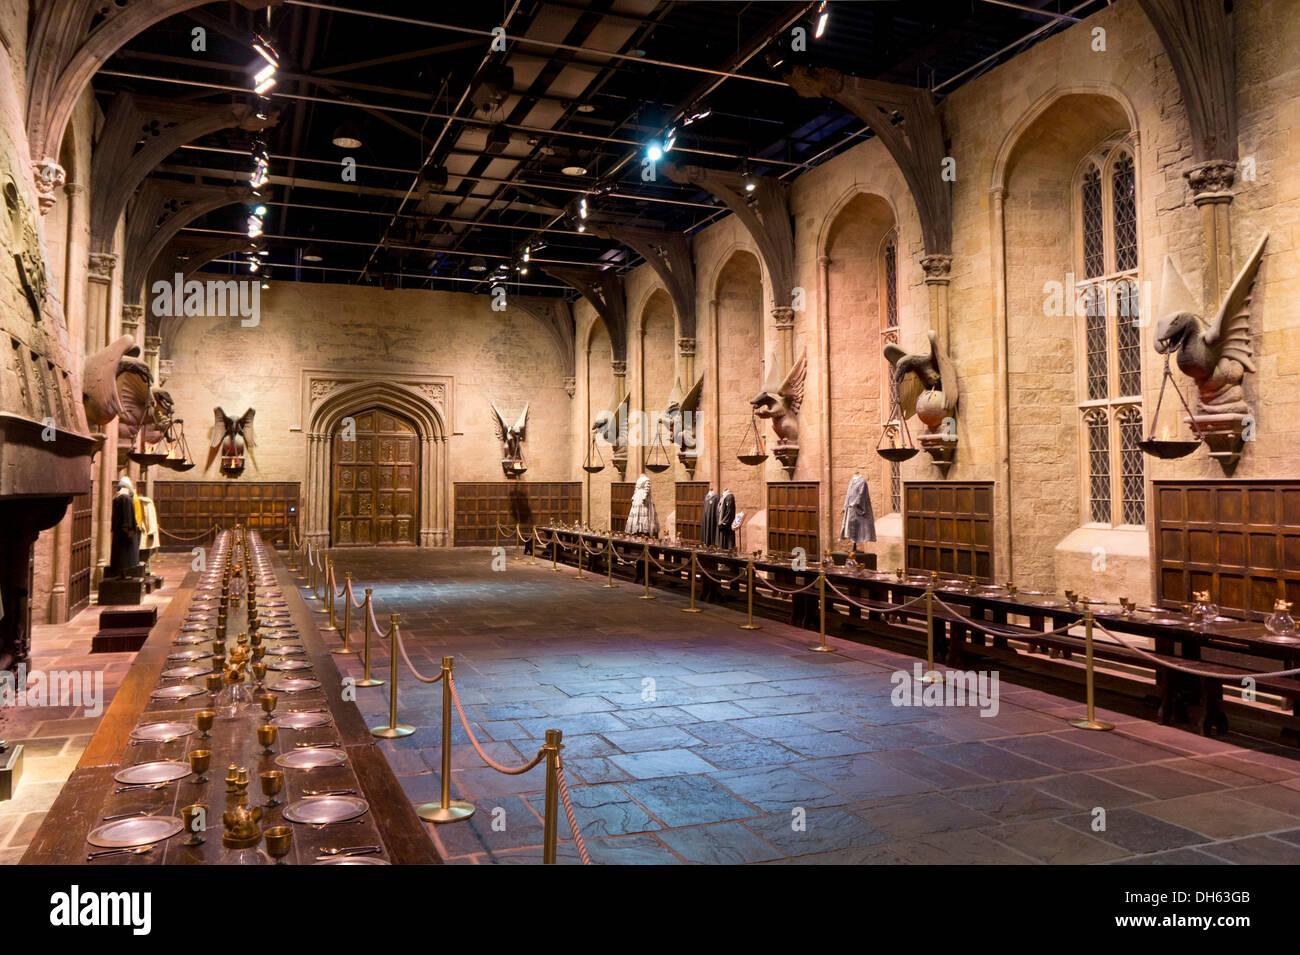 100 Hogwarts Dining Hall Harry Potter Museum London